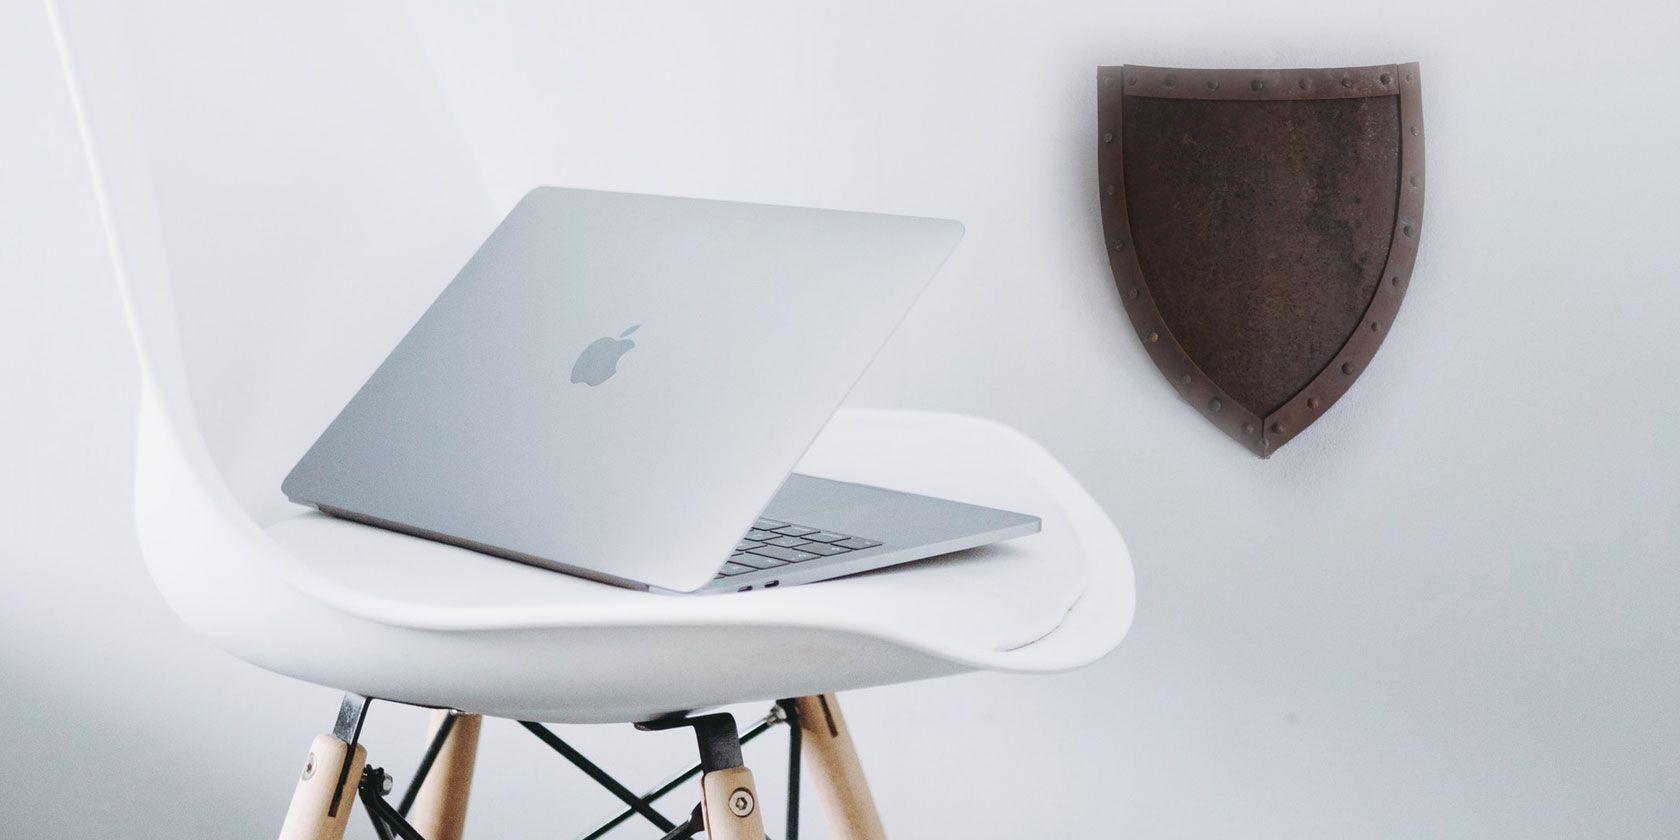 setup-vpn-mac